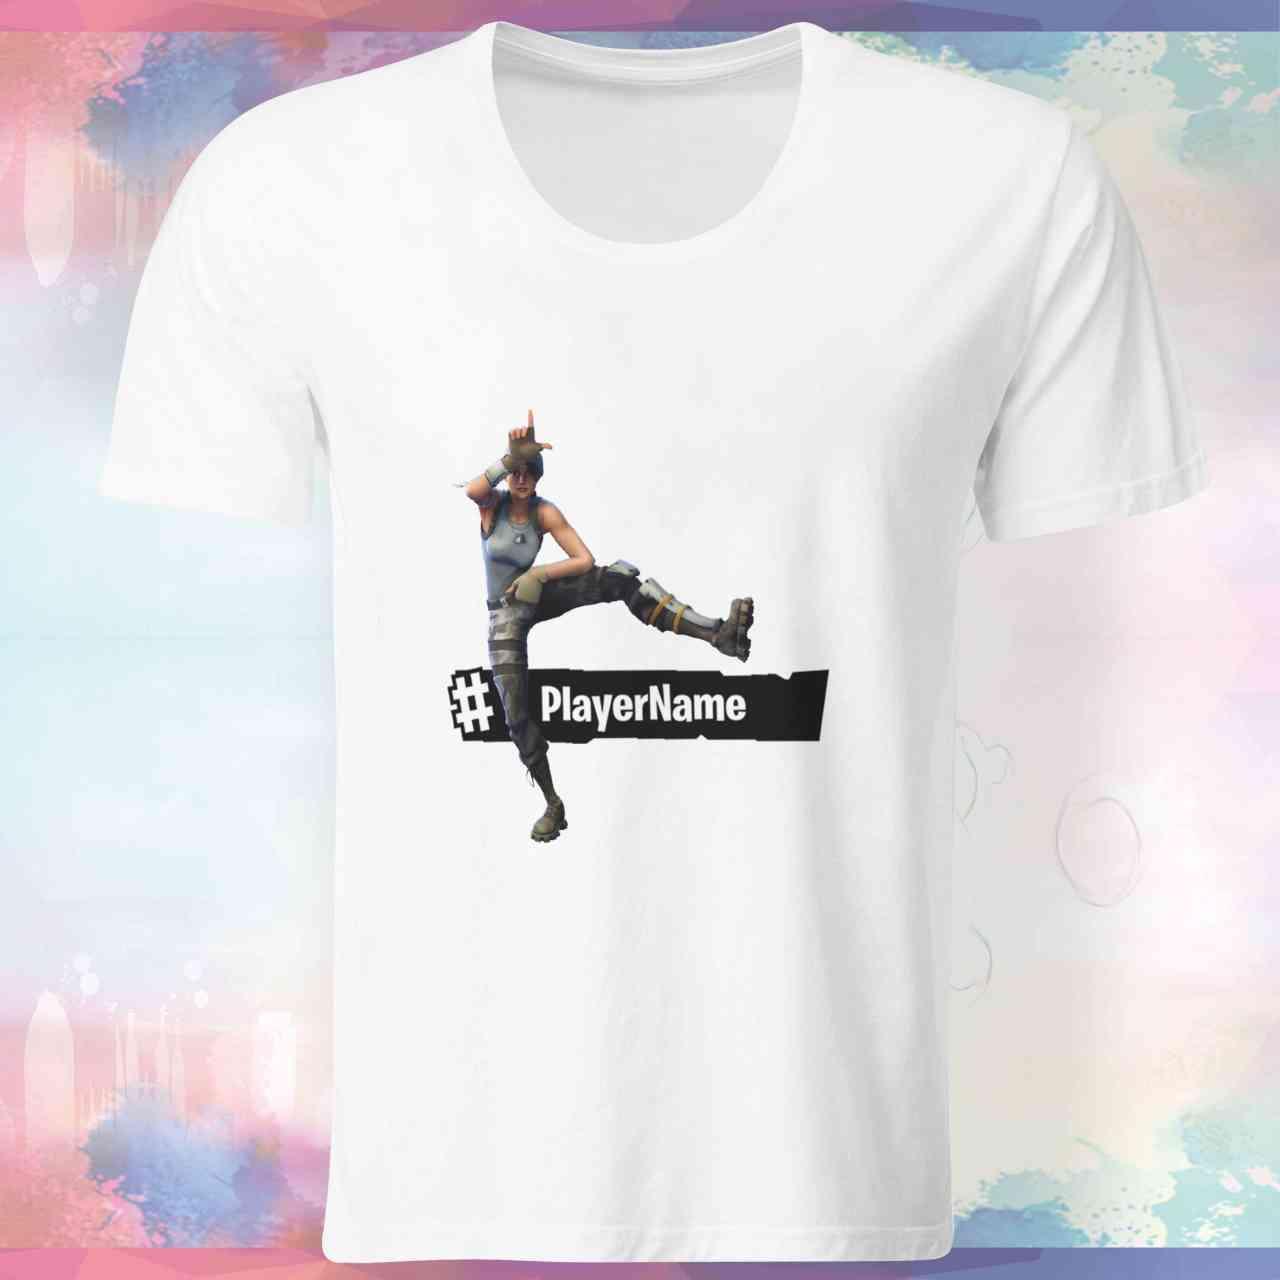 Fortnite Take The L Shirt   mit Player-Name   Battle Royal   T-Shirt   E-Sports - Gamer Nr.2